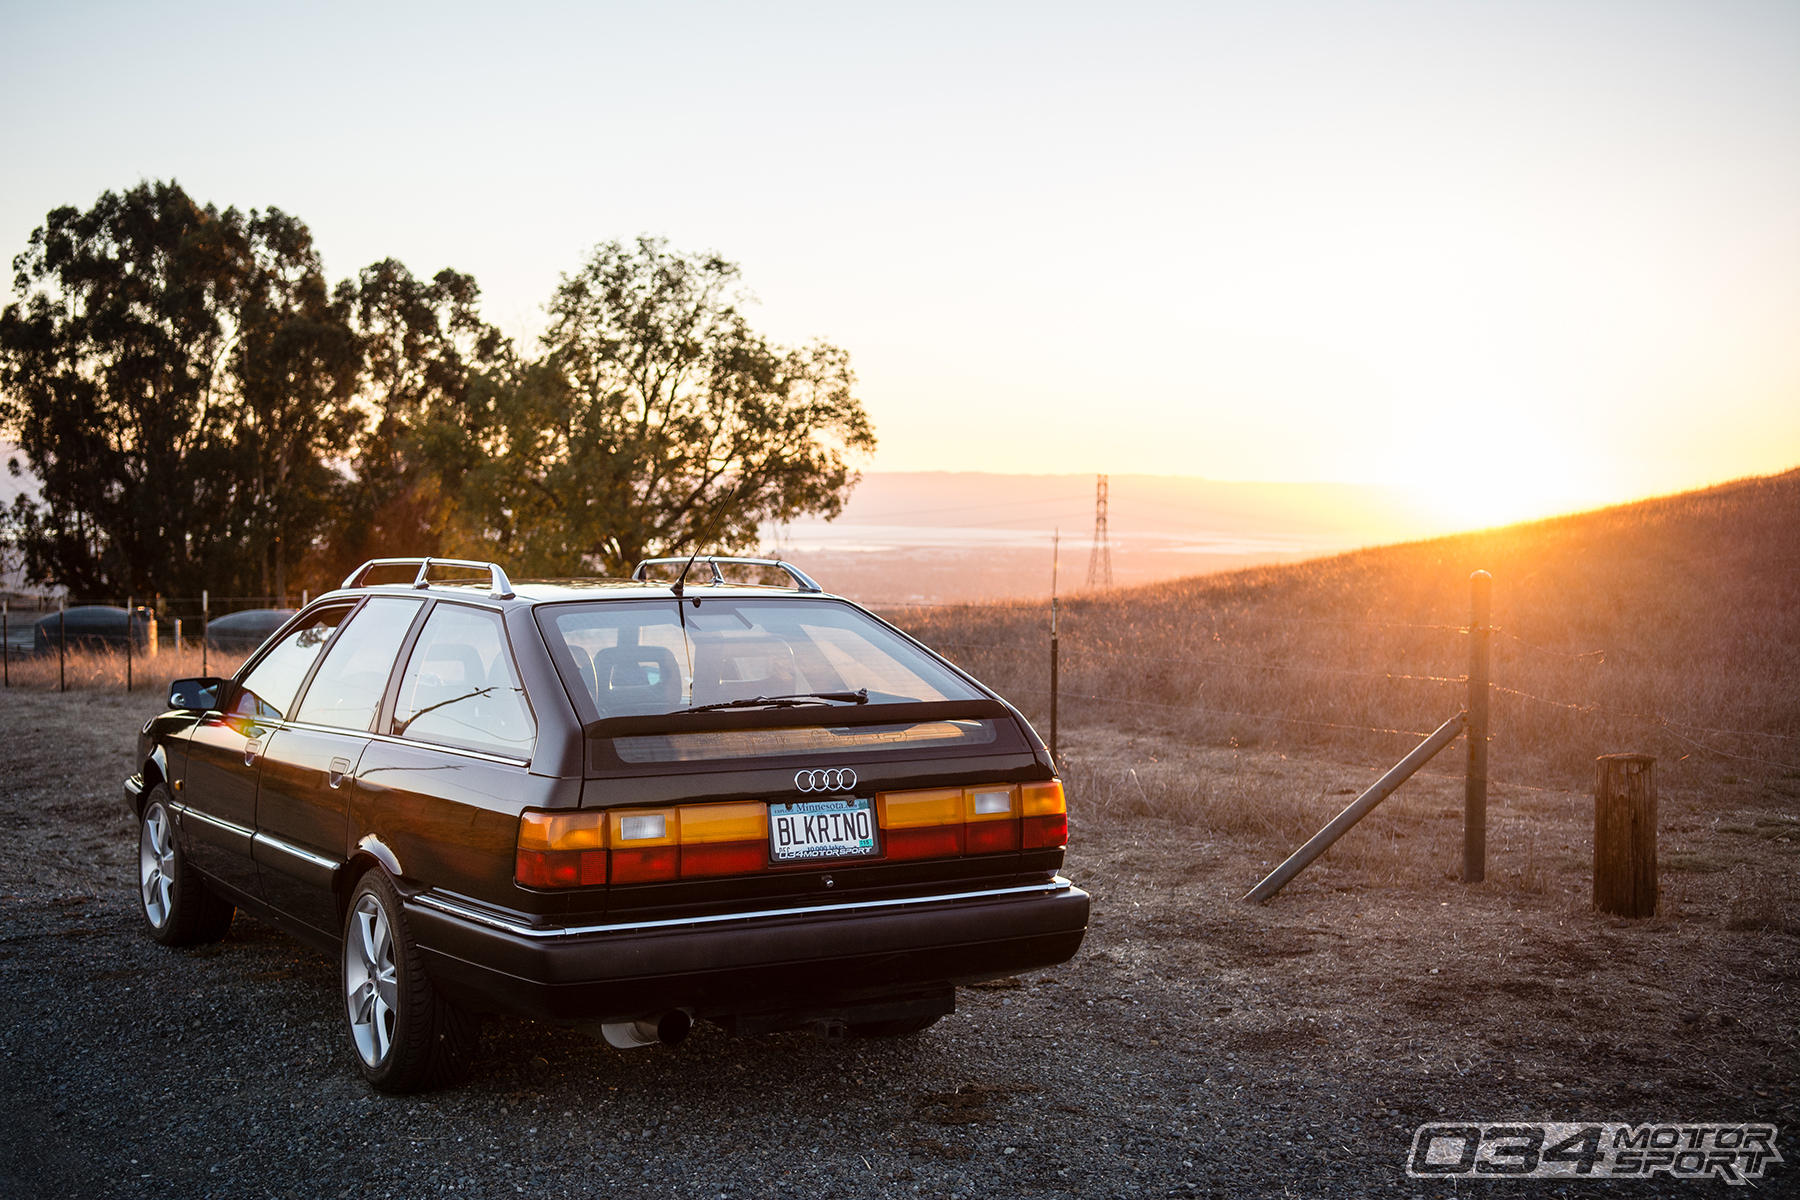 034Motorsport Turbo Audi 200 Avant